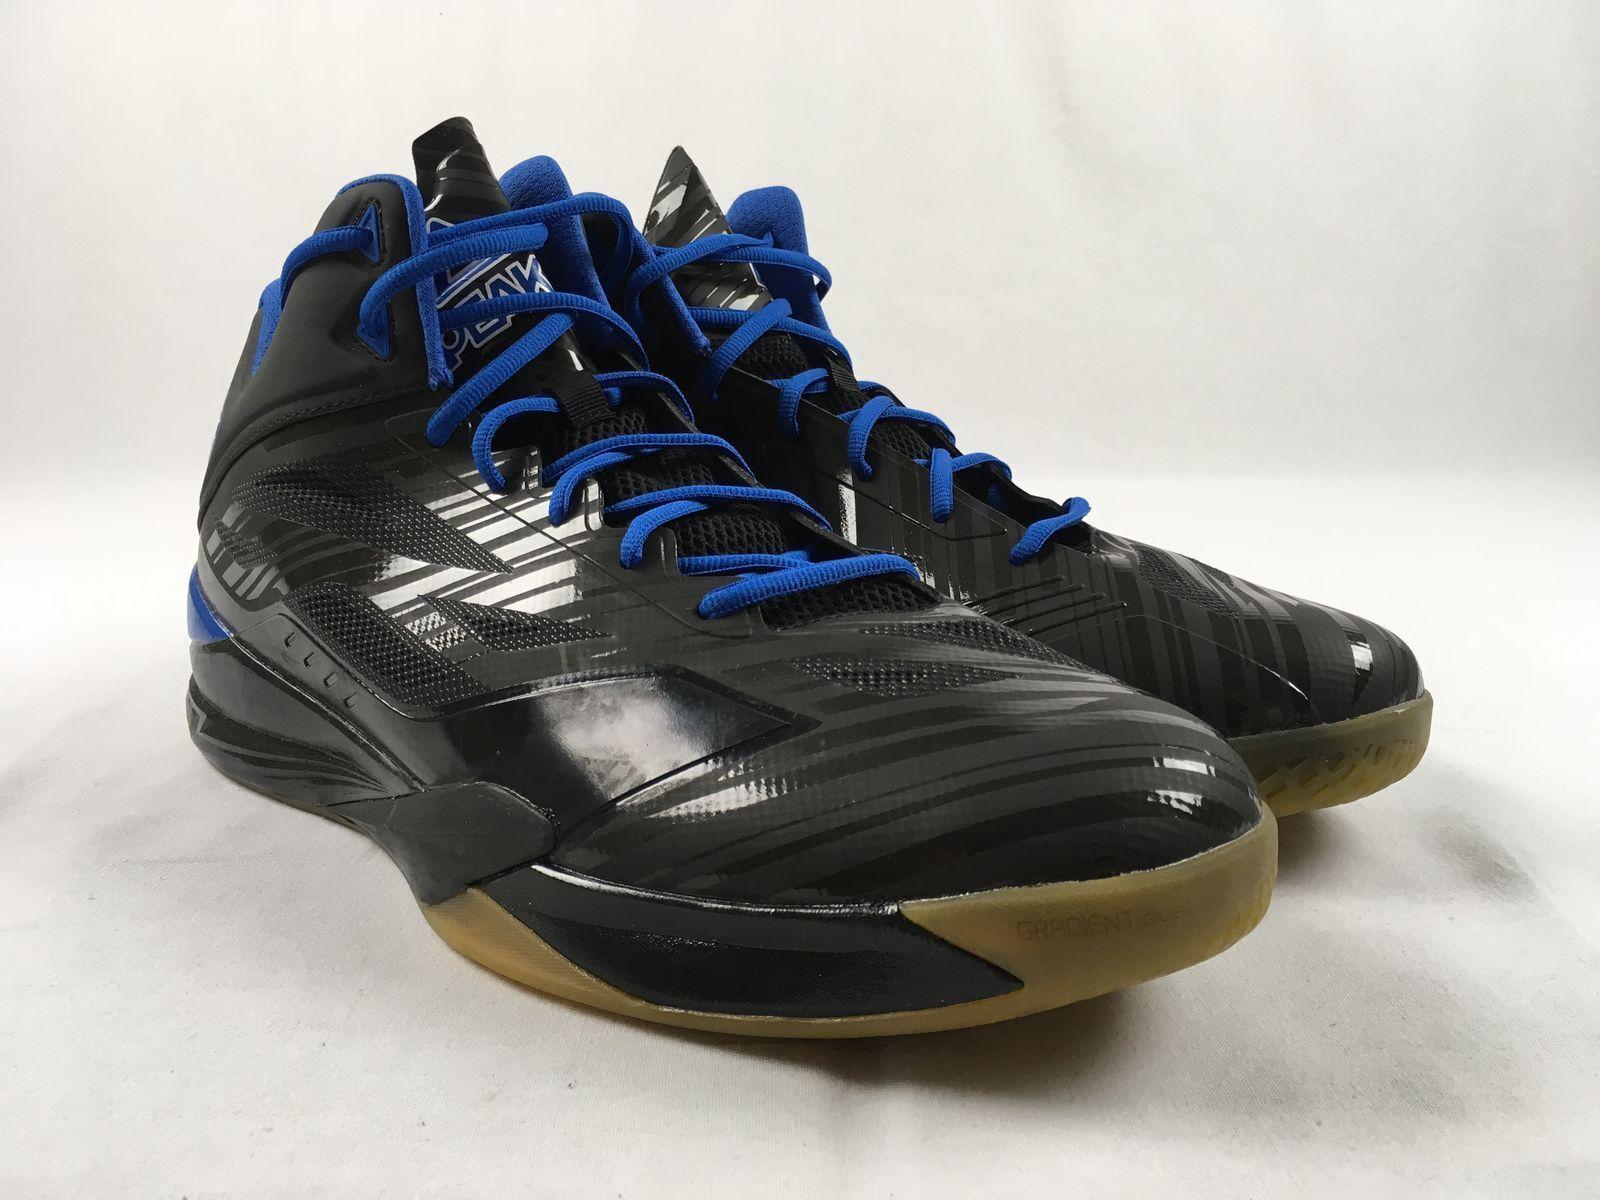 NEW Peak Peak Basketball - Black/Blue Basketball Shoes (Men's 18)